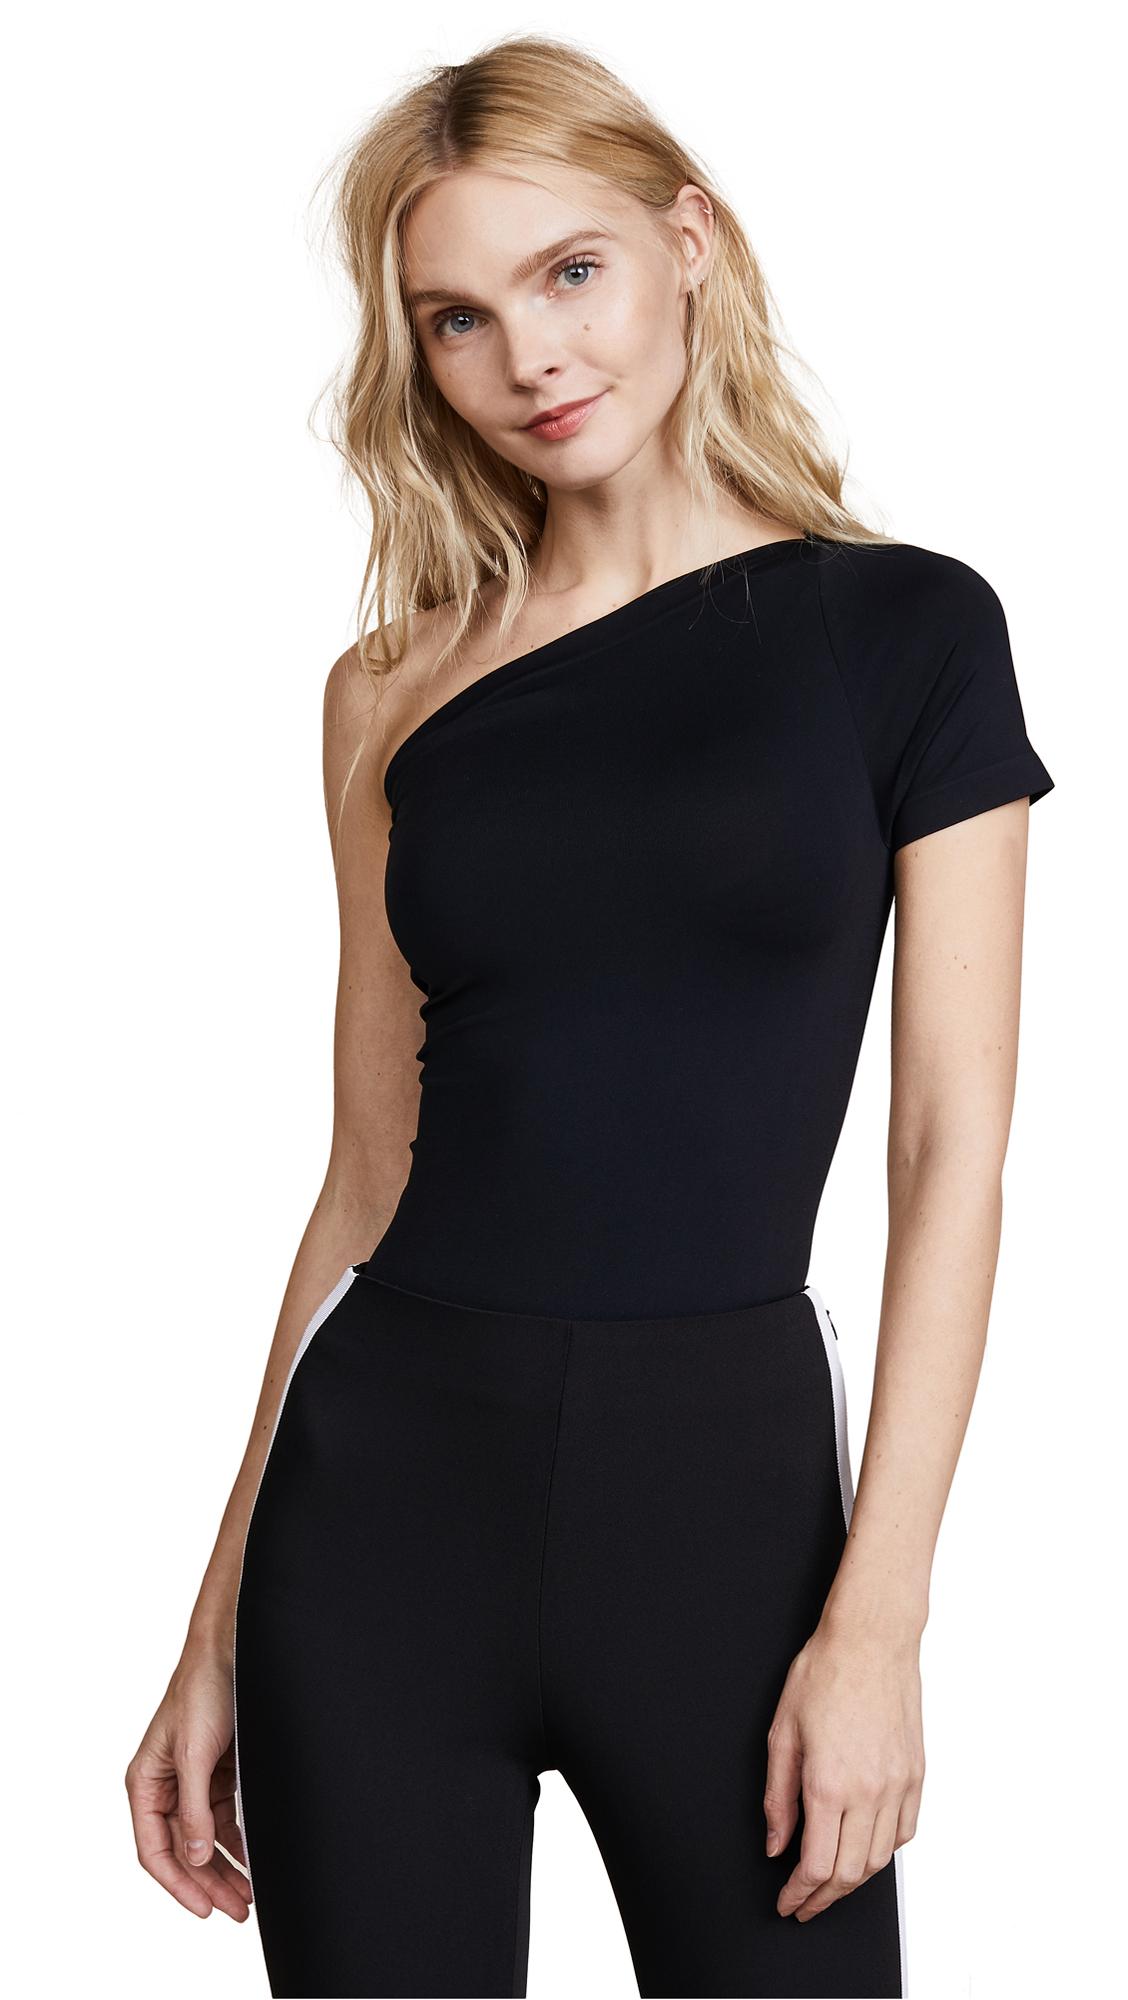 Helmut Lang Asymmetrical Seamless Bodysuit - Black